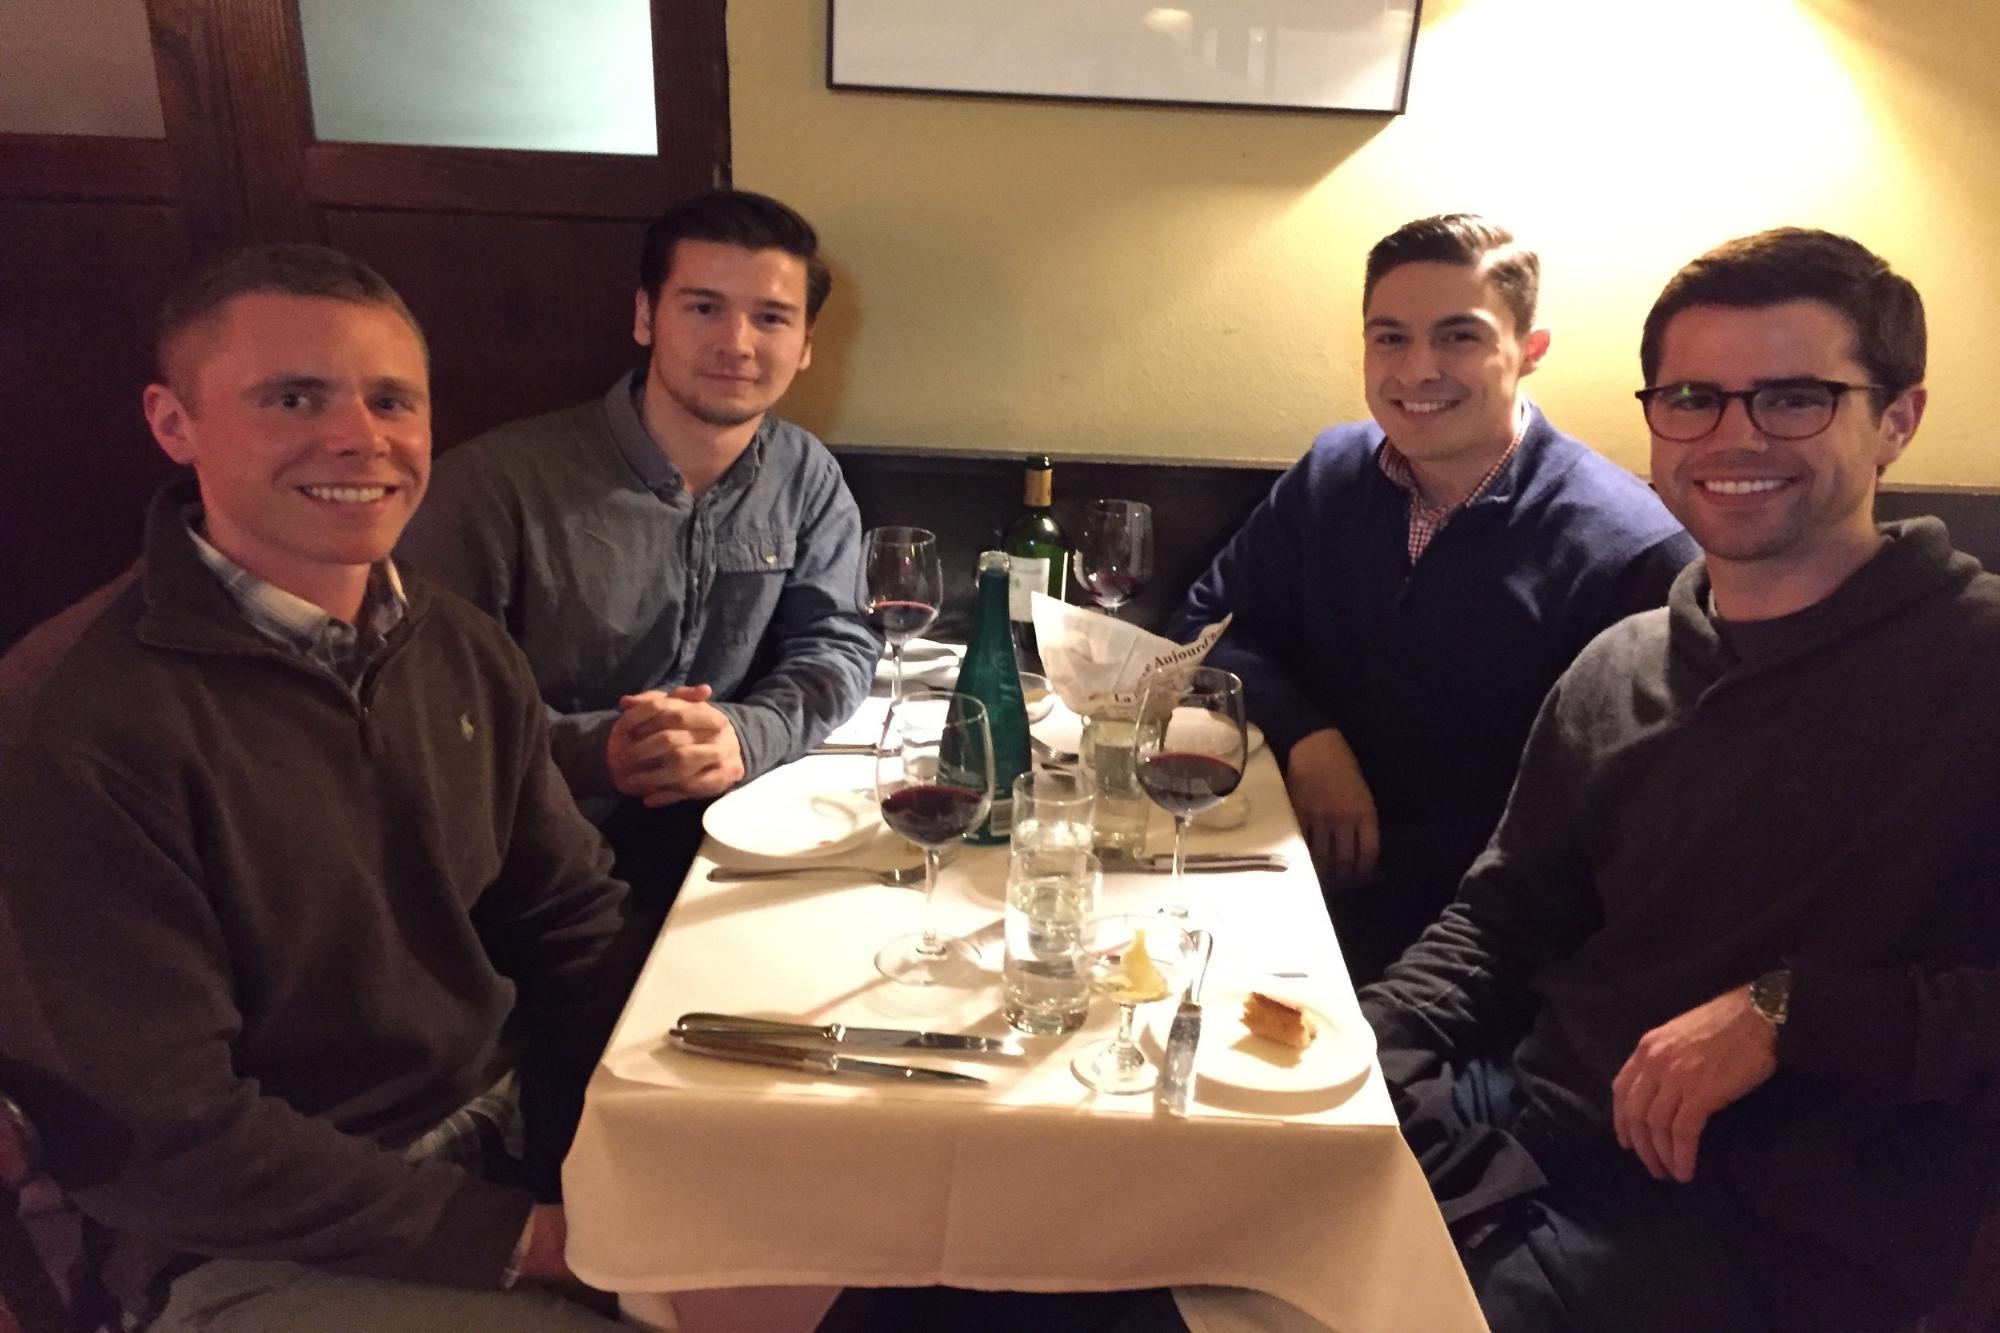 From left to right: Joe, Luke, Bryan, Regan